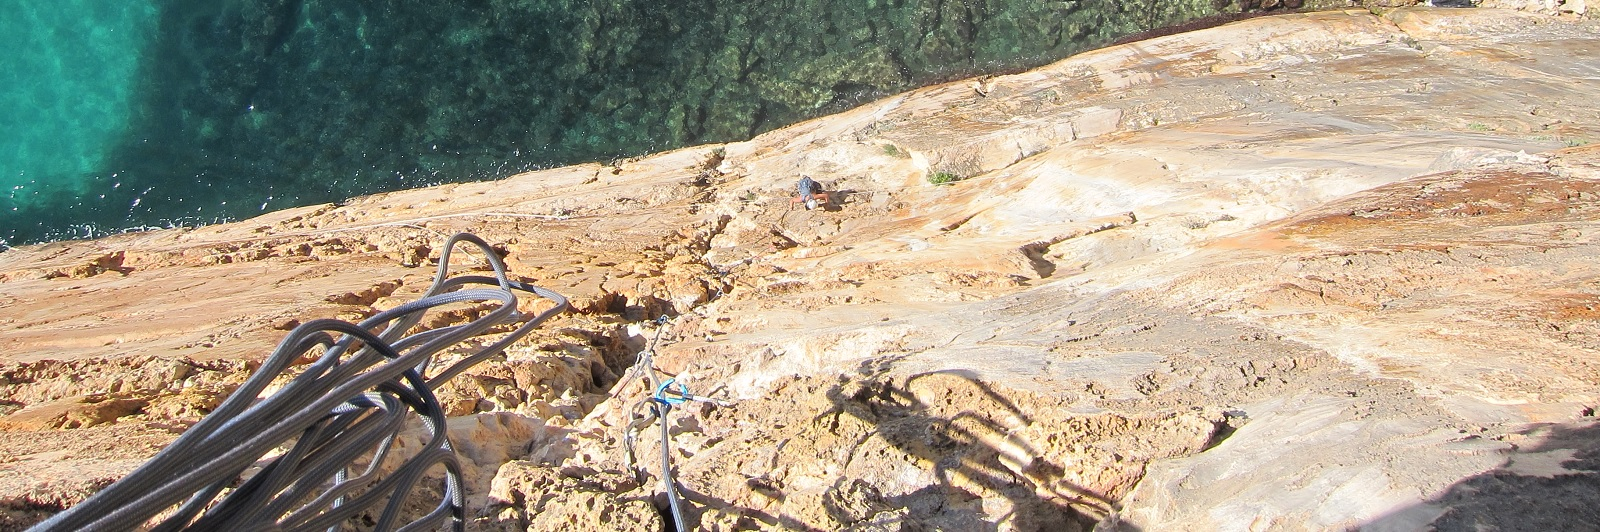 Multi pitch climbing holiday costa blanca_1370